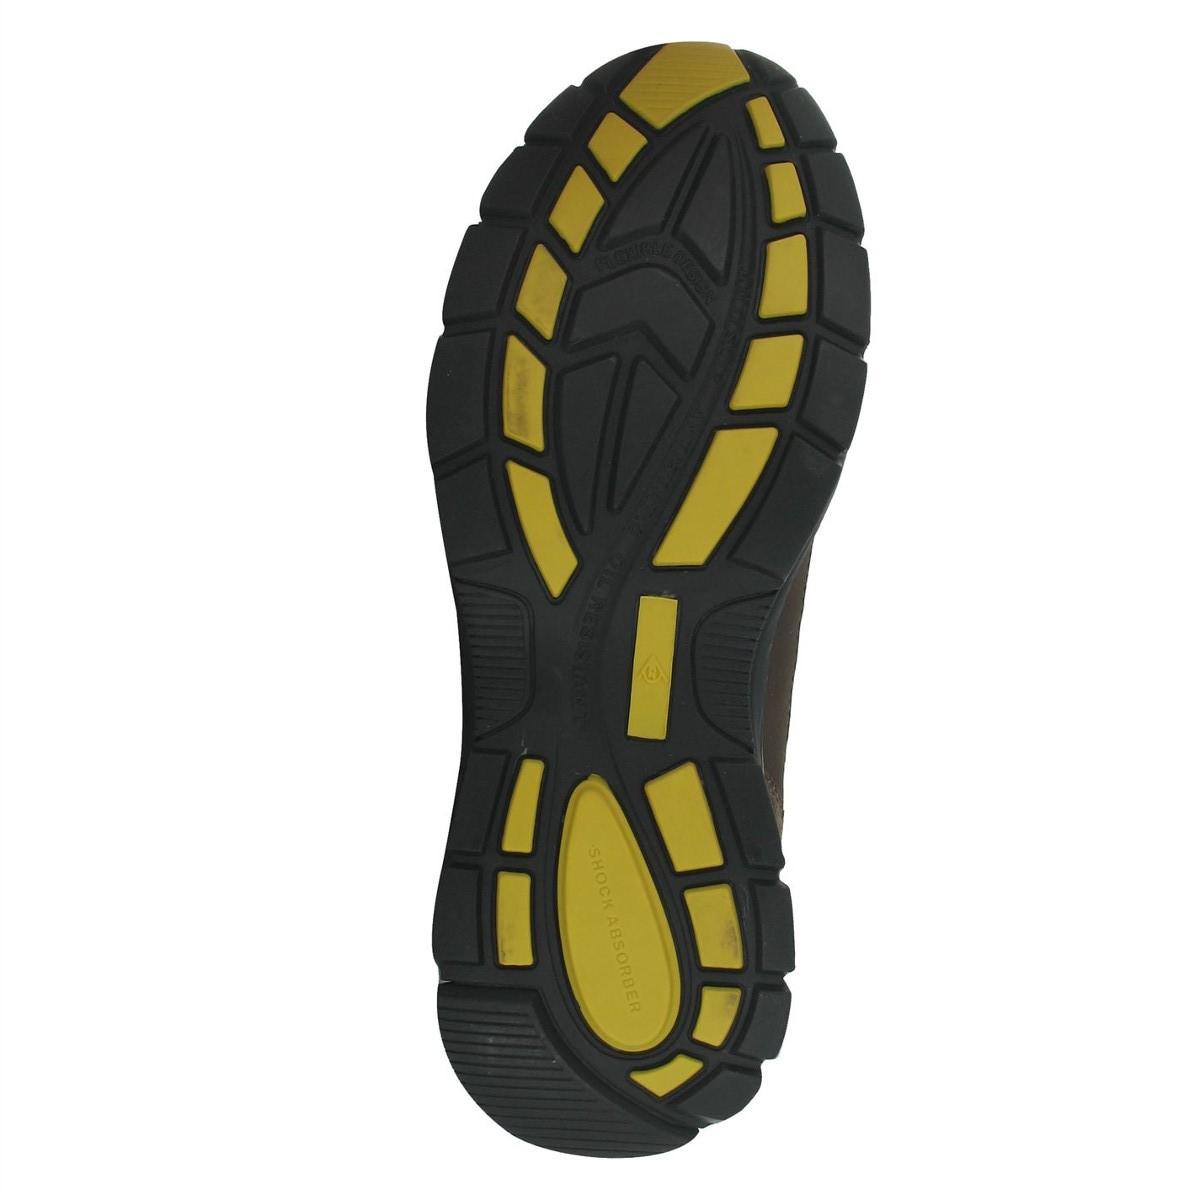 Safety Iowa Steel Toe Work Shoes